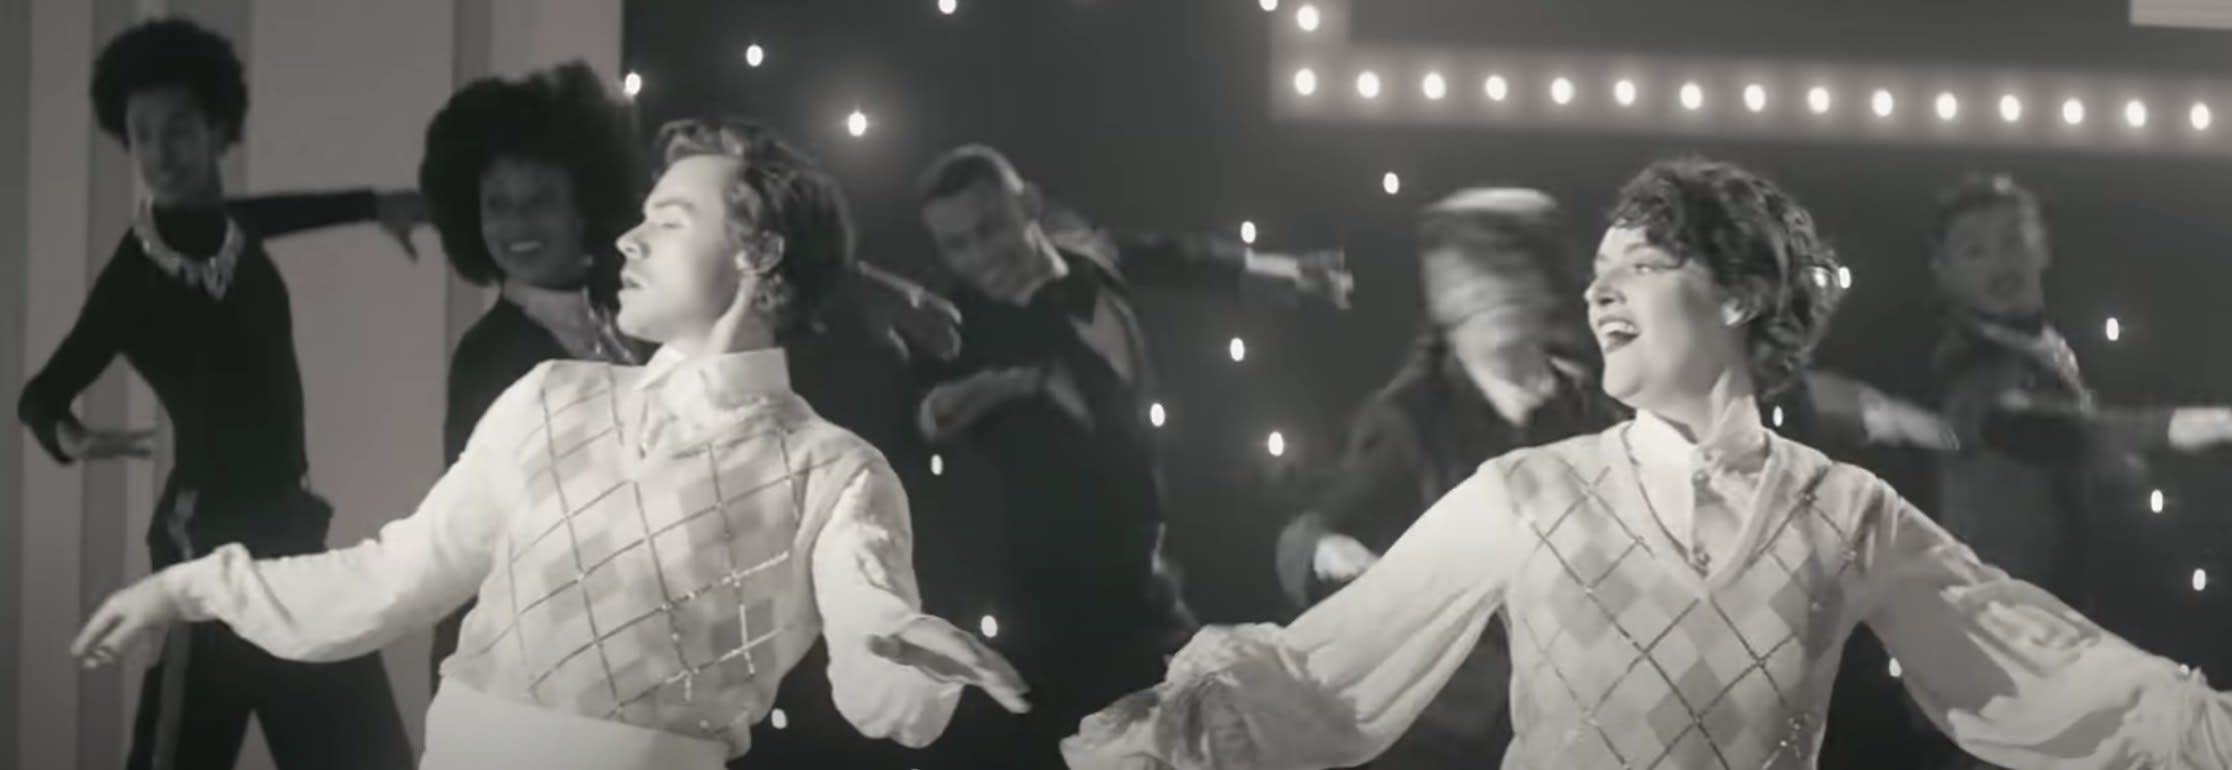 Harry Styles e Phoebe Waller-Bridge dançando